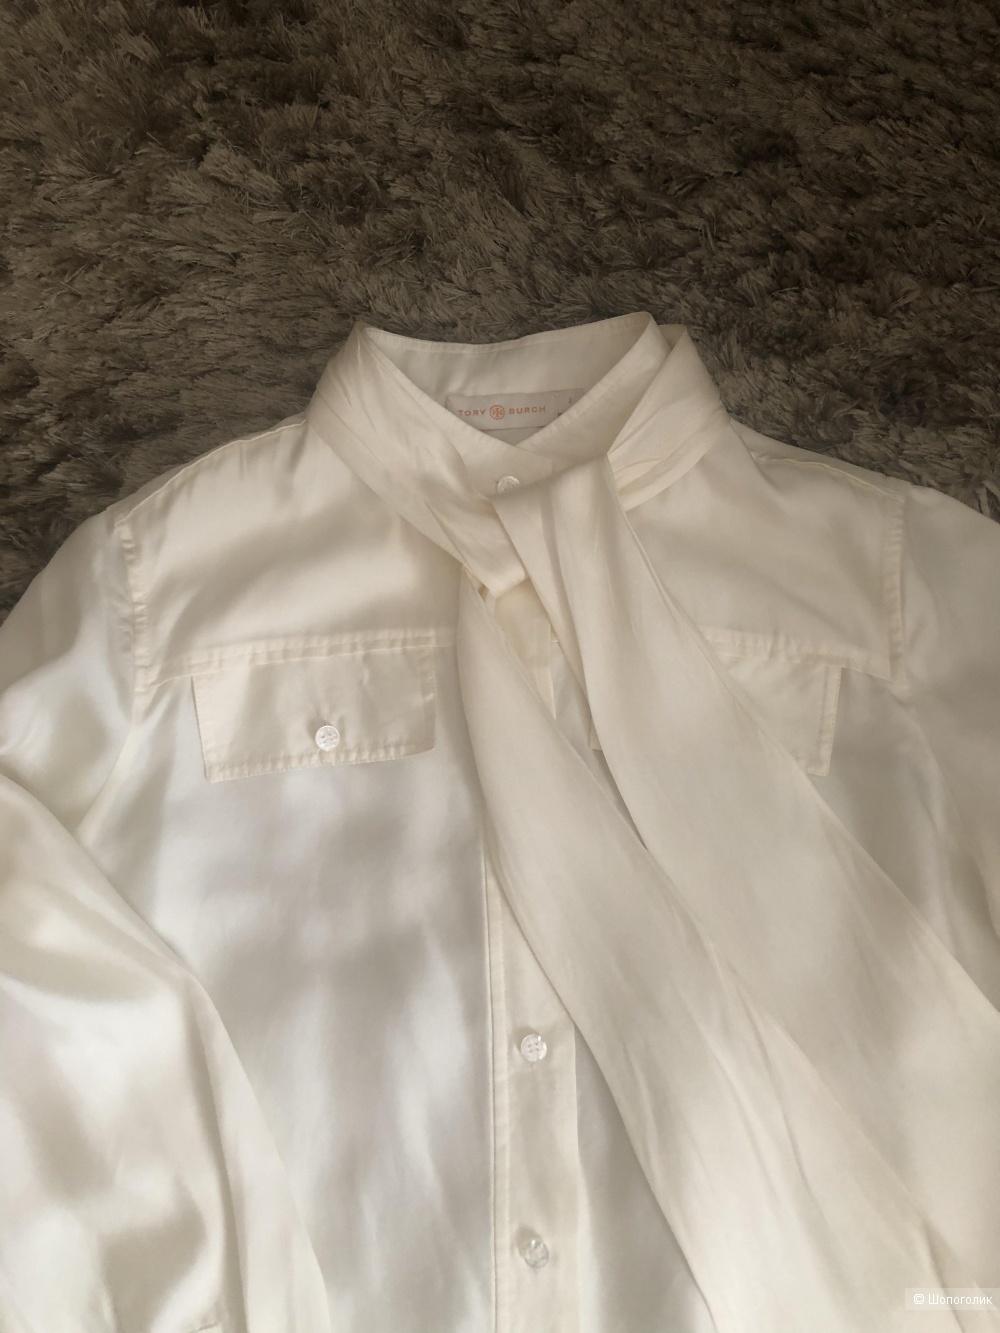 Блузка Tory Burch. Размер 8US(42-44)